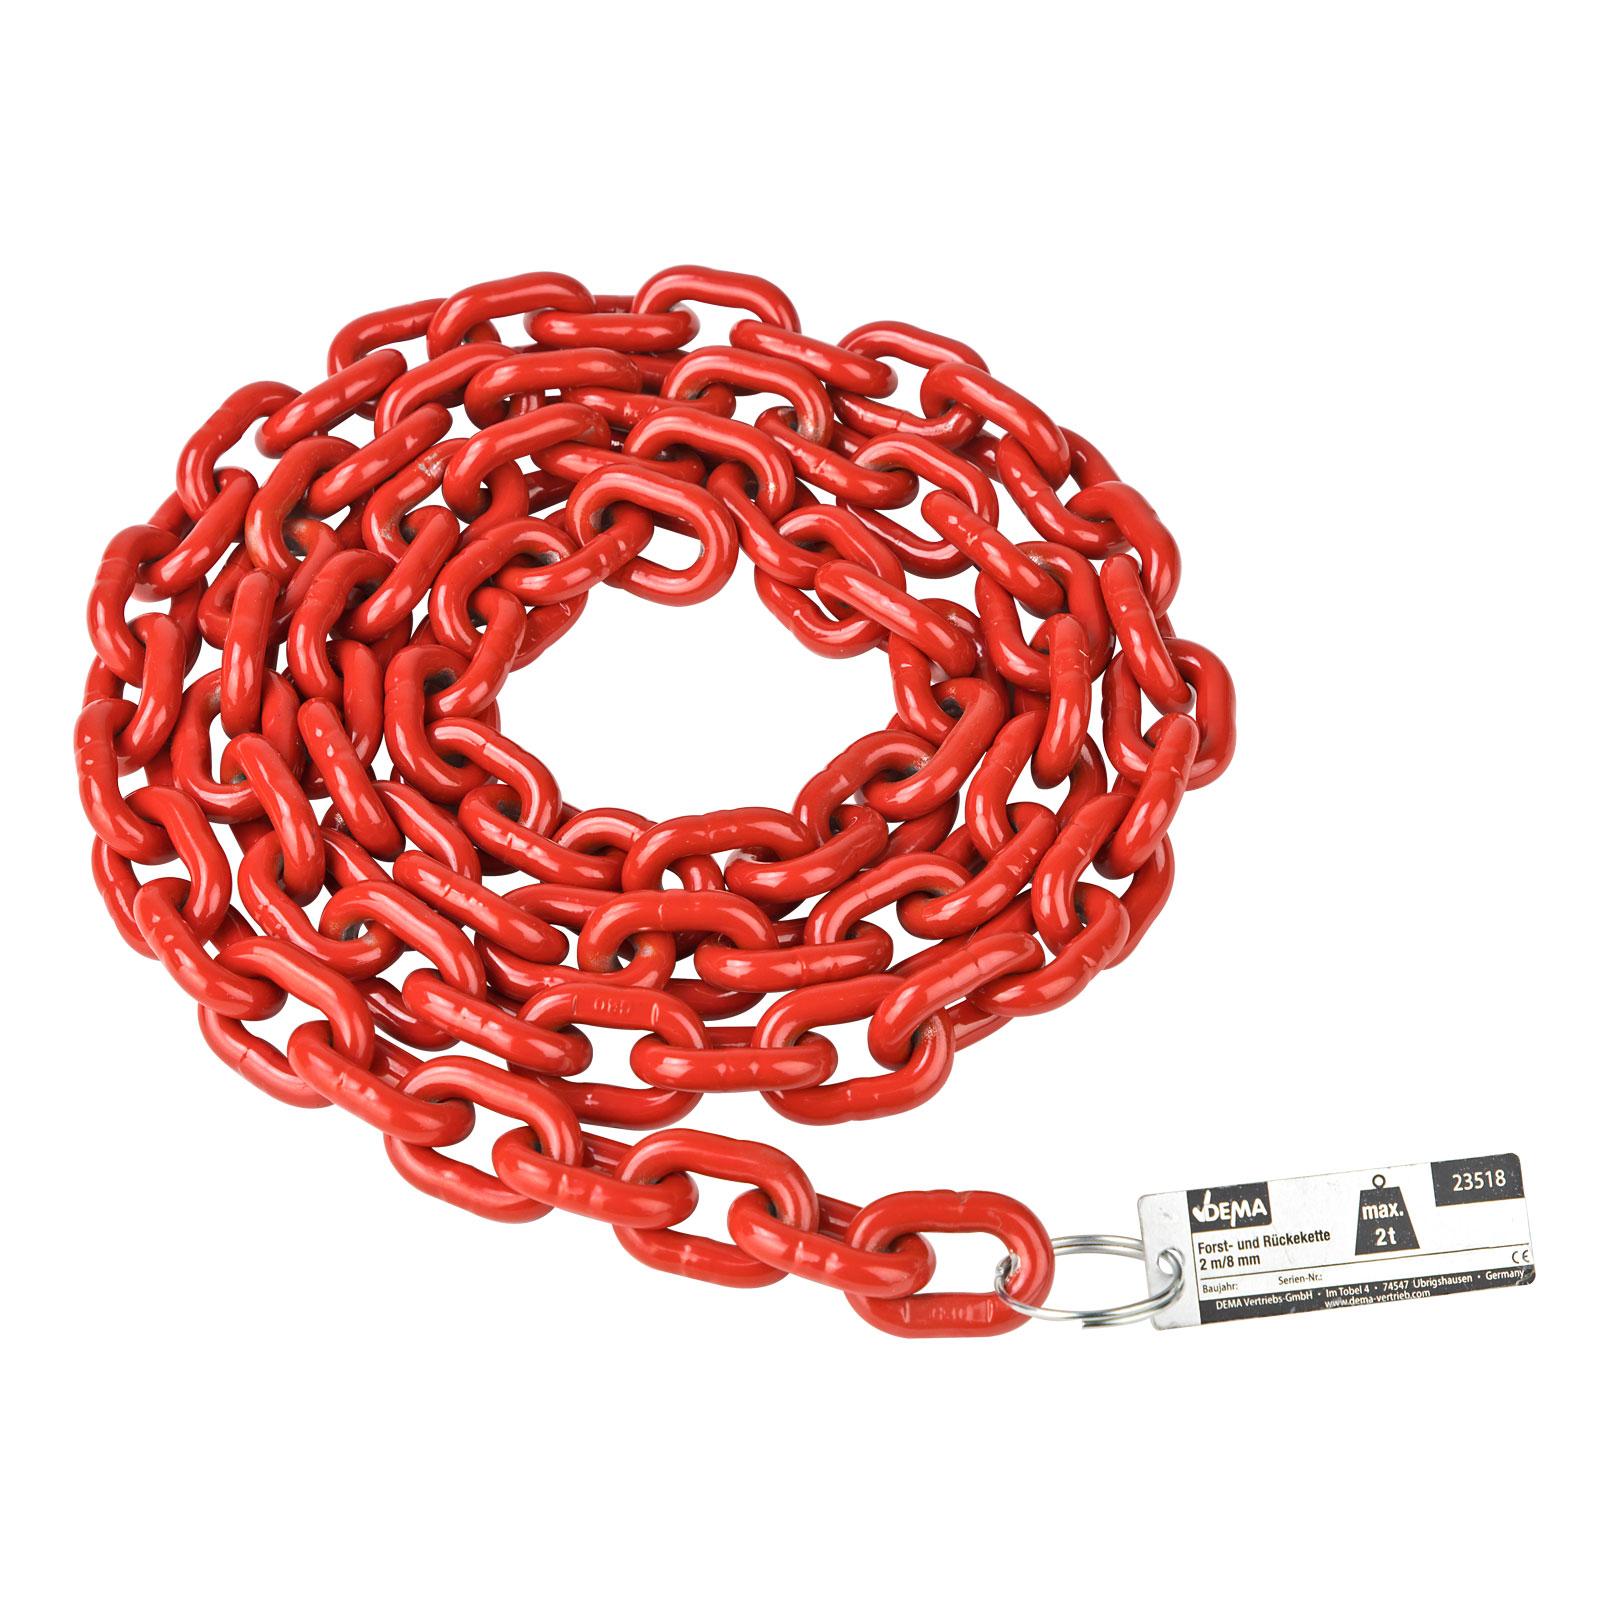 Dema Stahl Forstkette Rückekette 2m 8mm 2t rot Güteklasse 8 23518